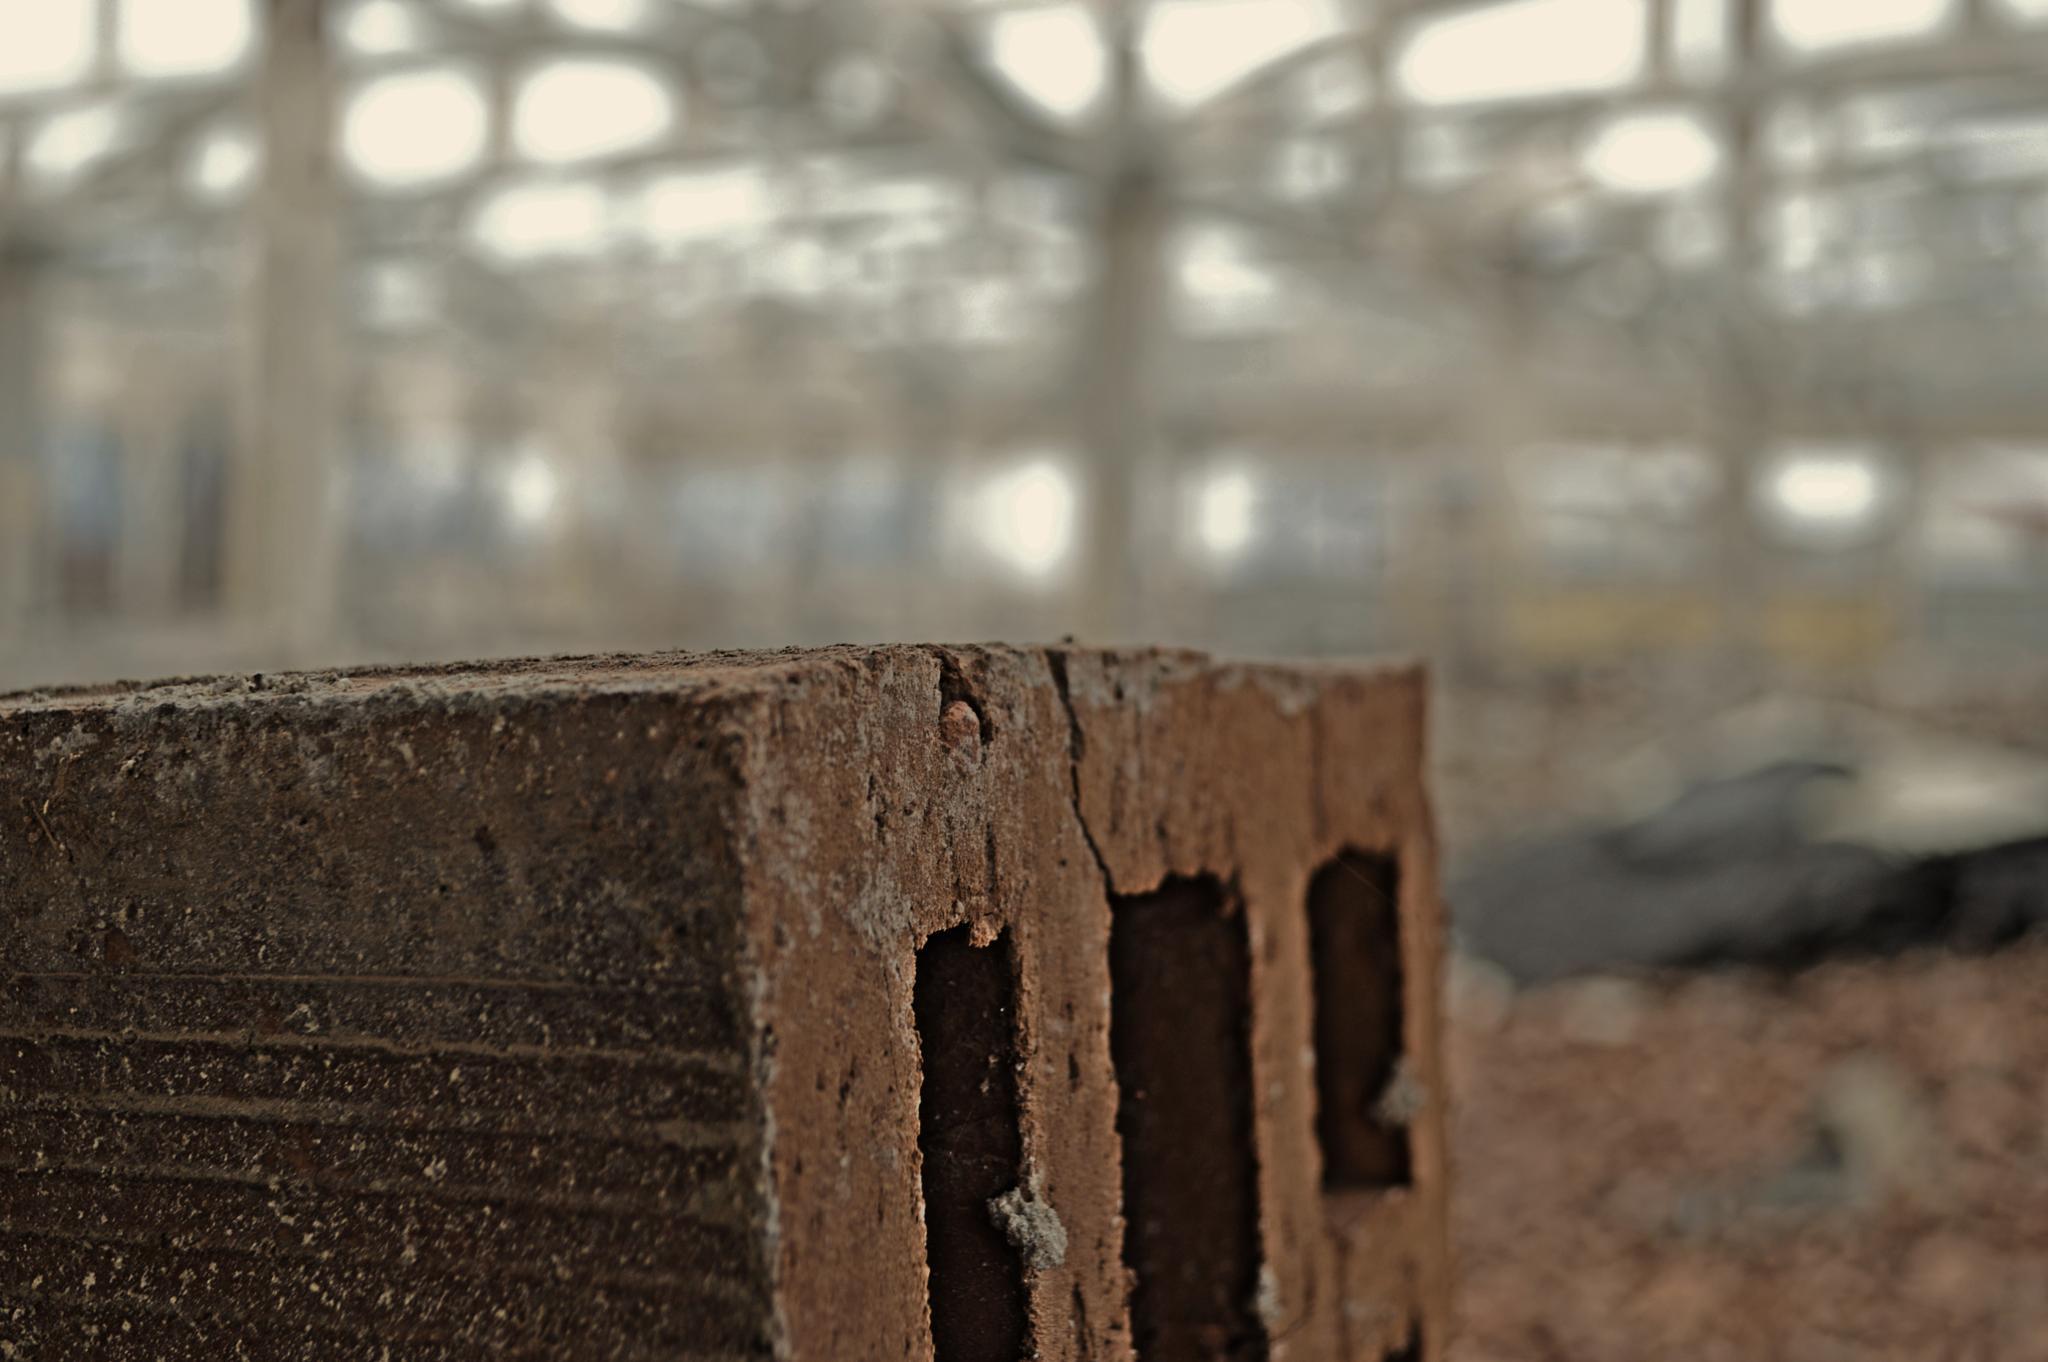 The Brick by krastioto